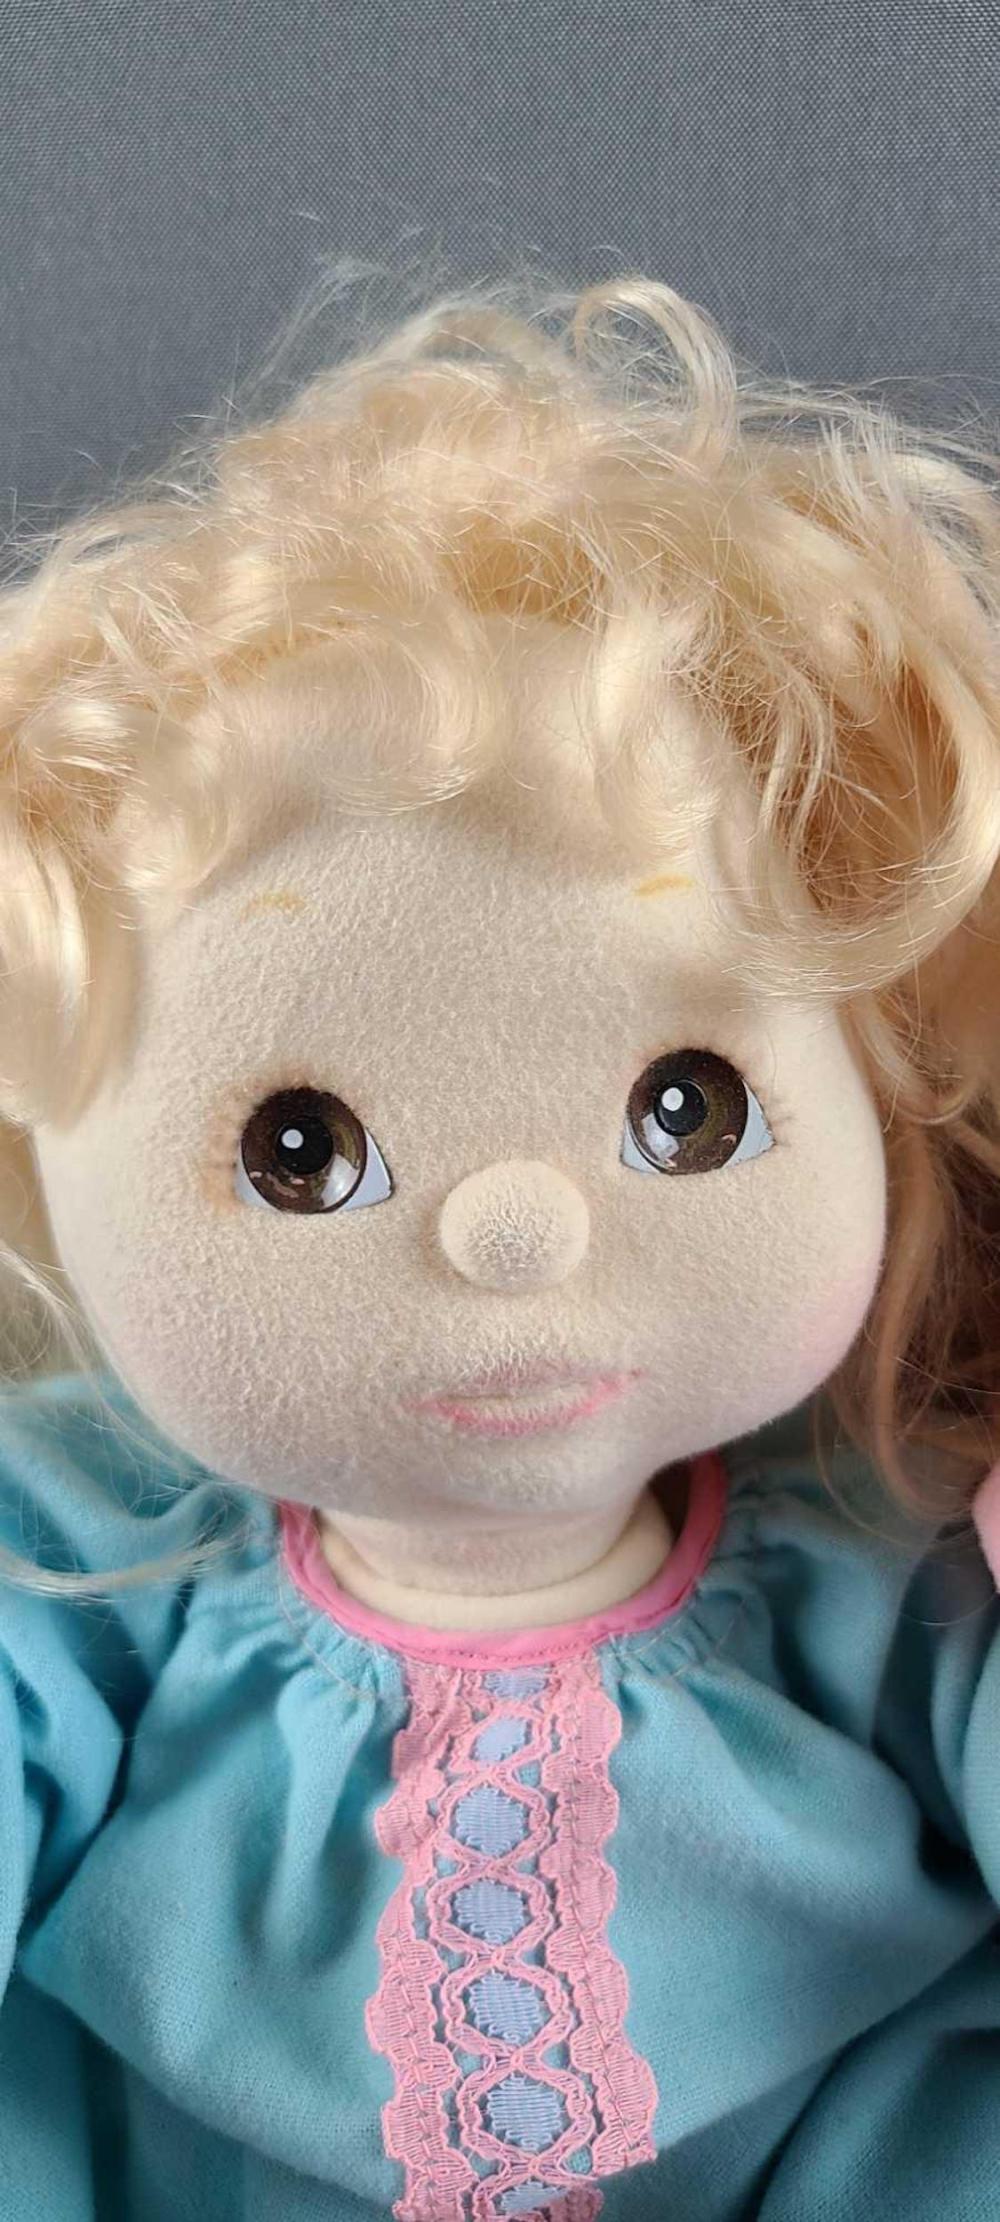 2 My Child dolls